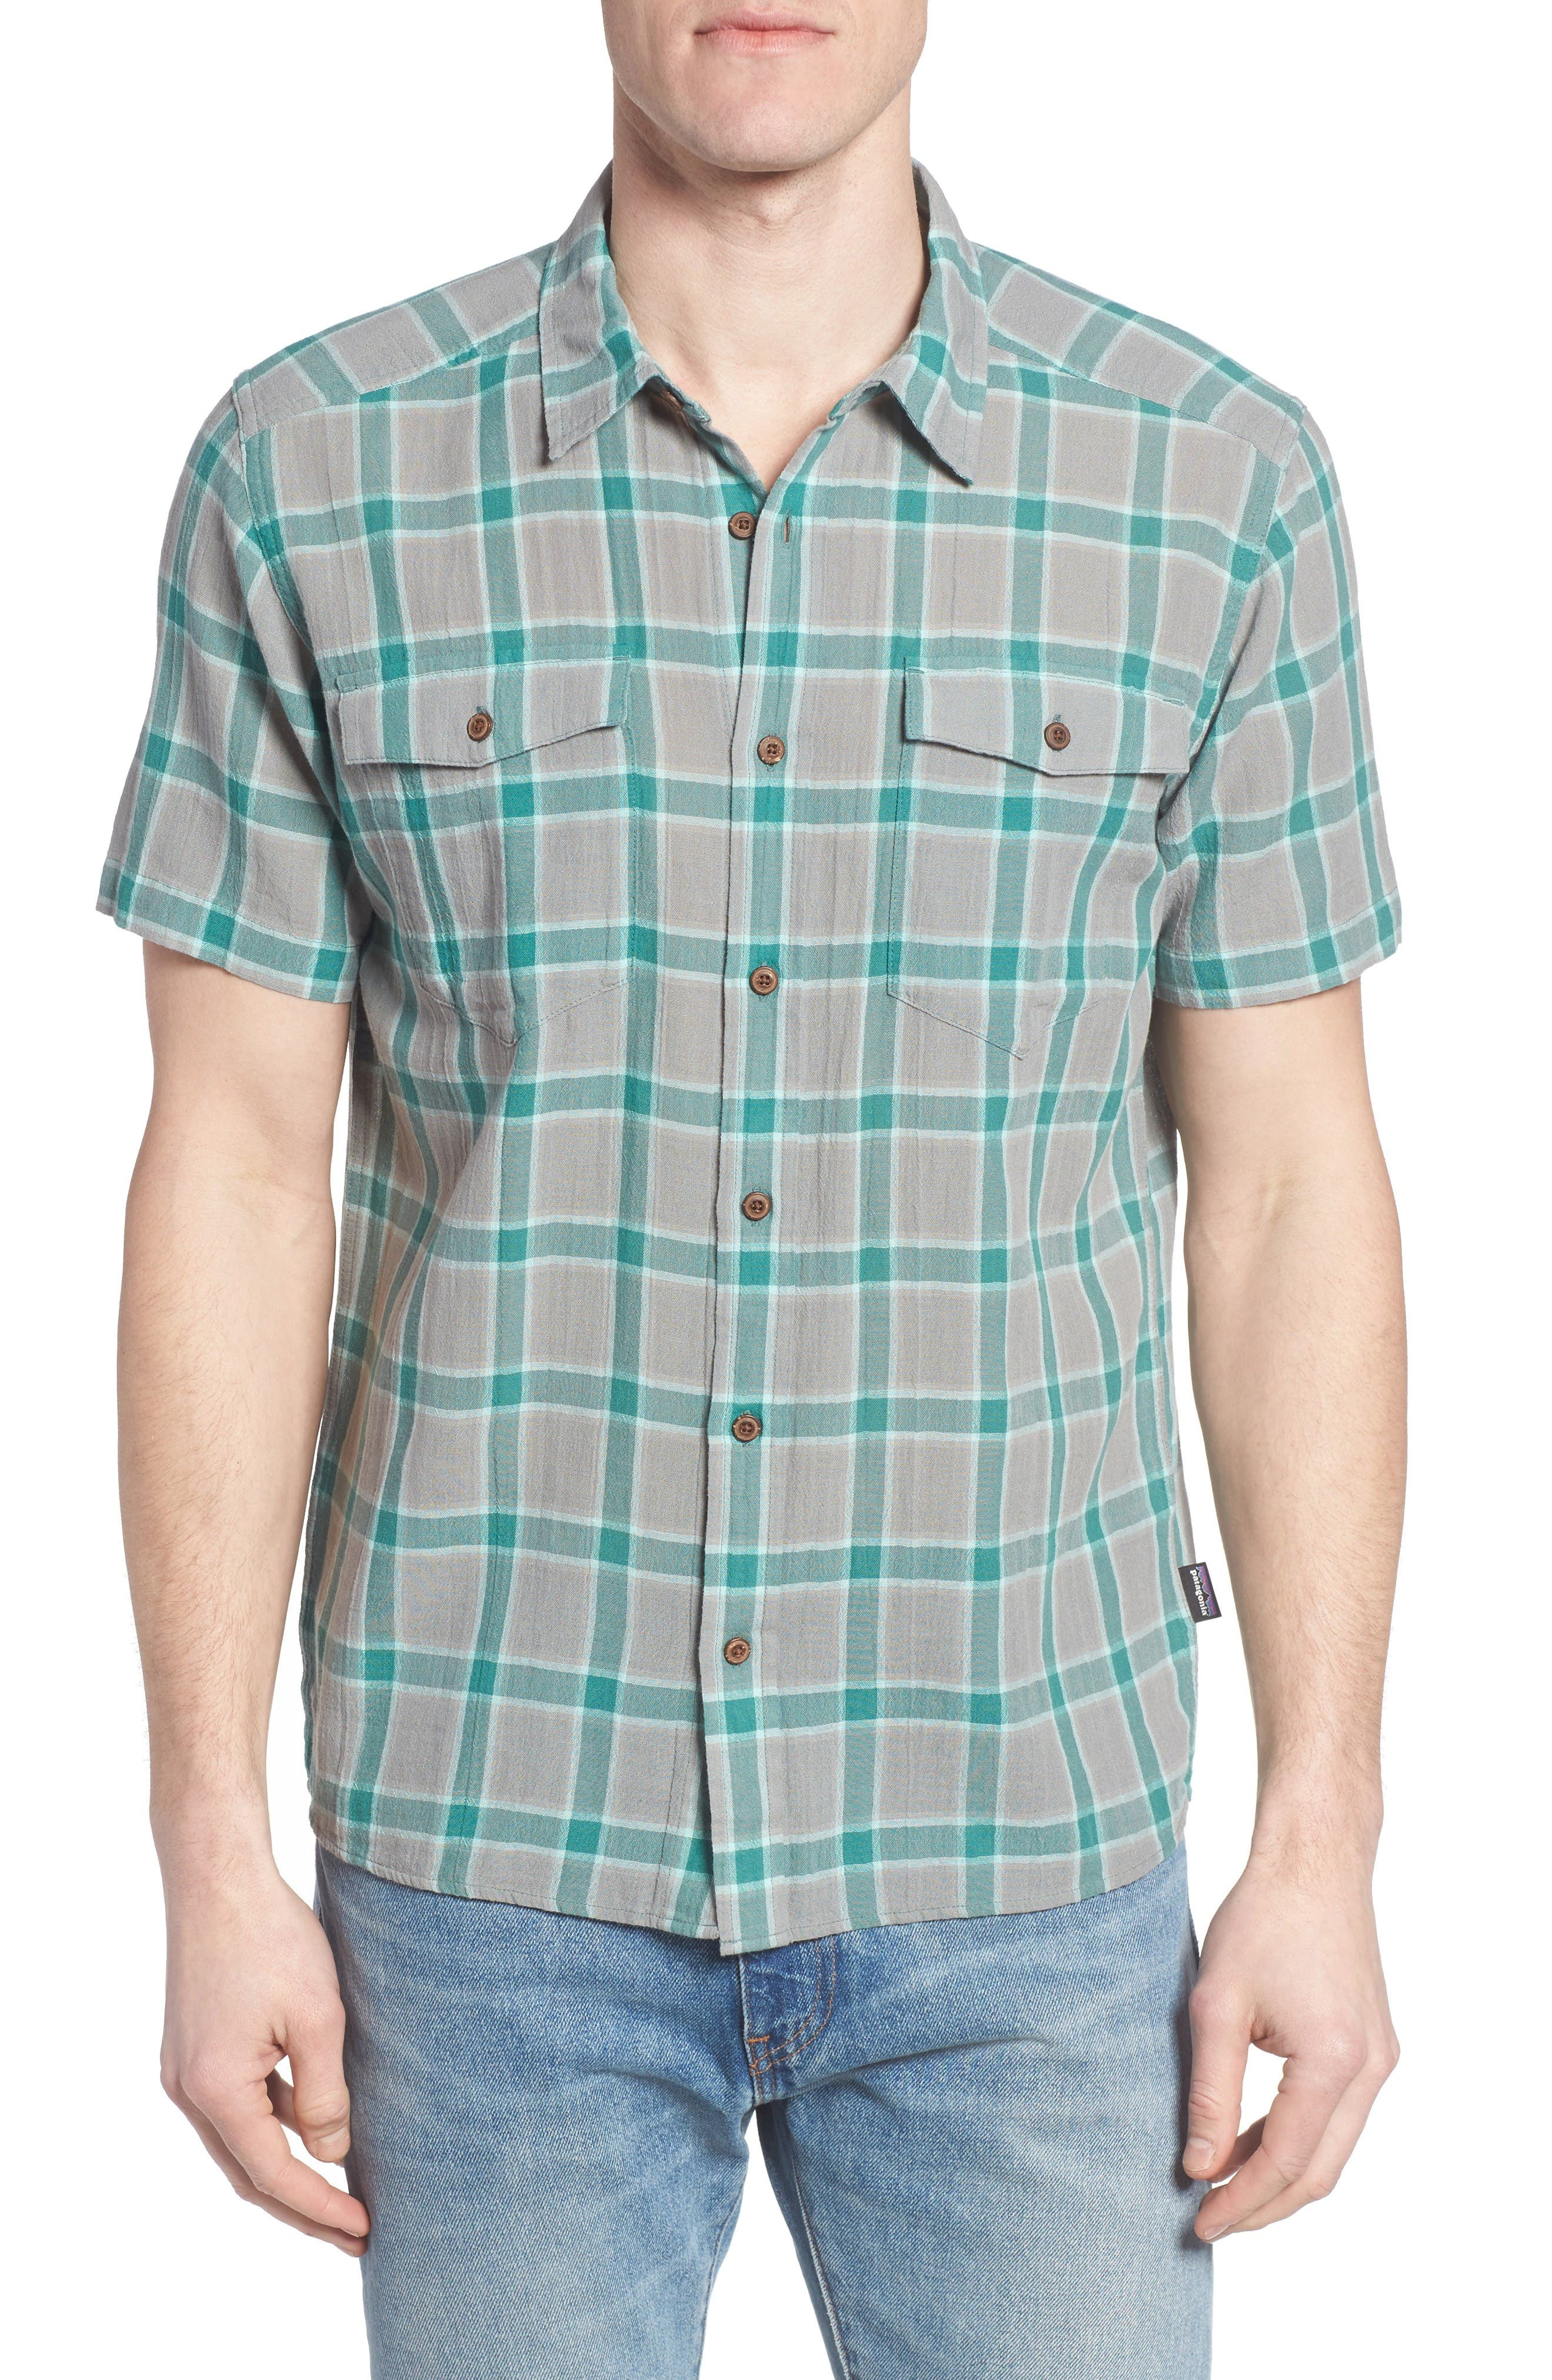 Patagonia Steersman Regular Fit Plaid Shirt